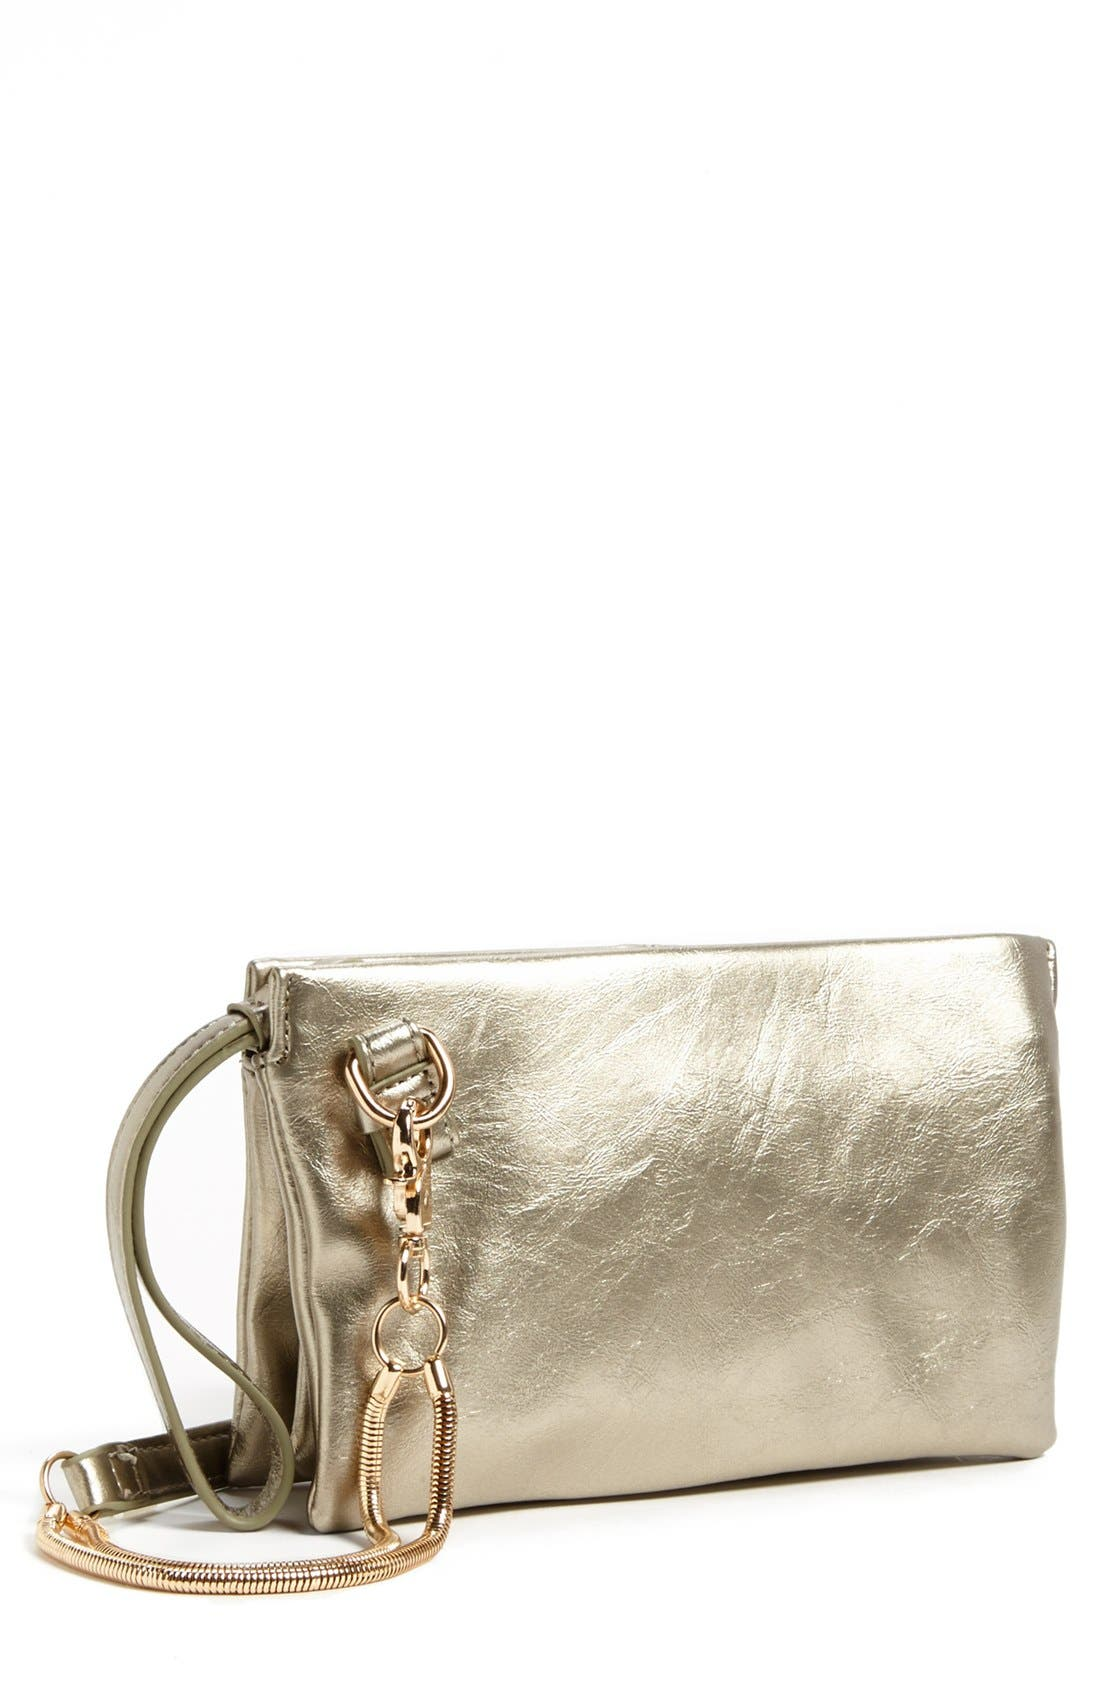 Main Image - POVERTY FLATS by rian Convertible Crossbody Bag